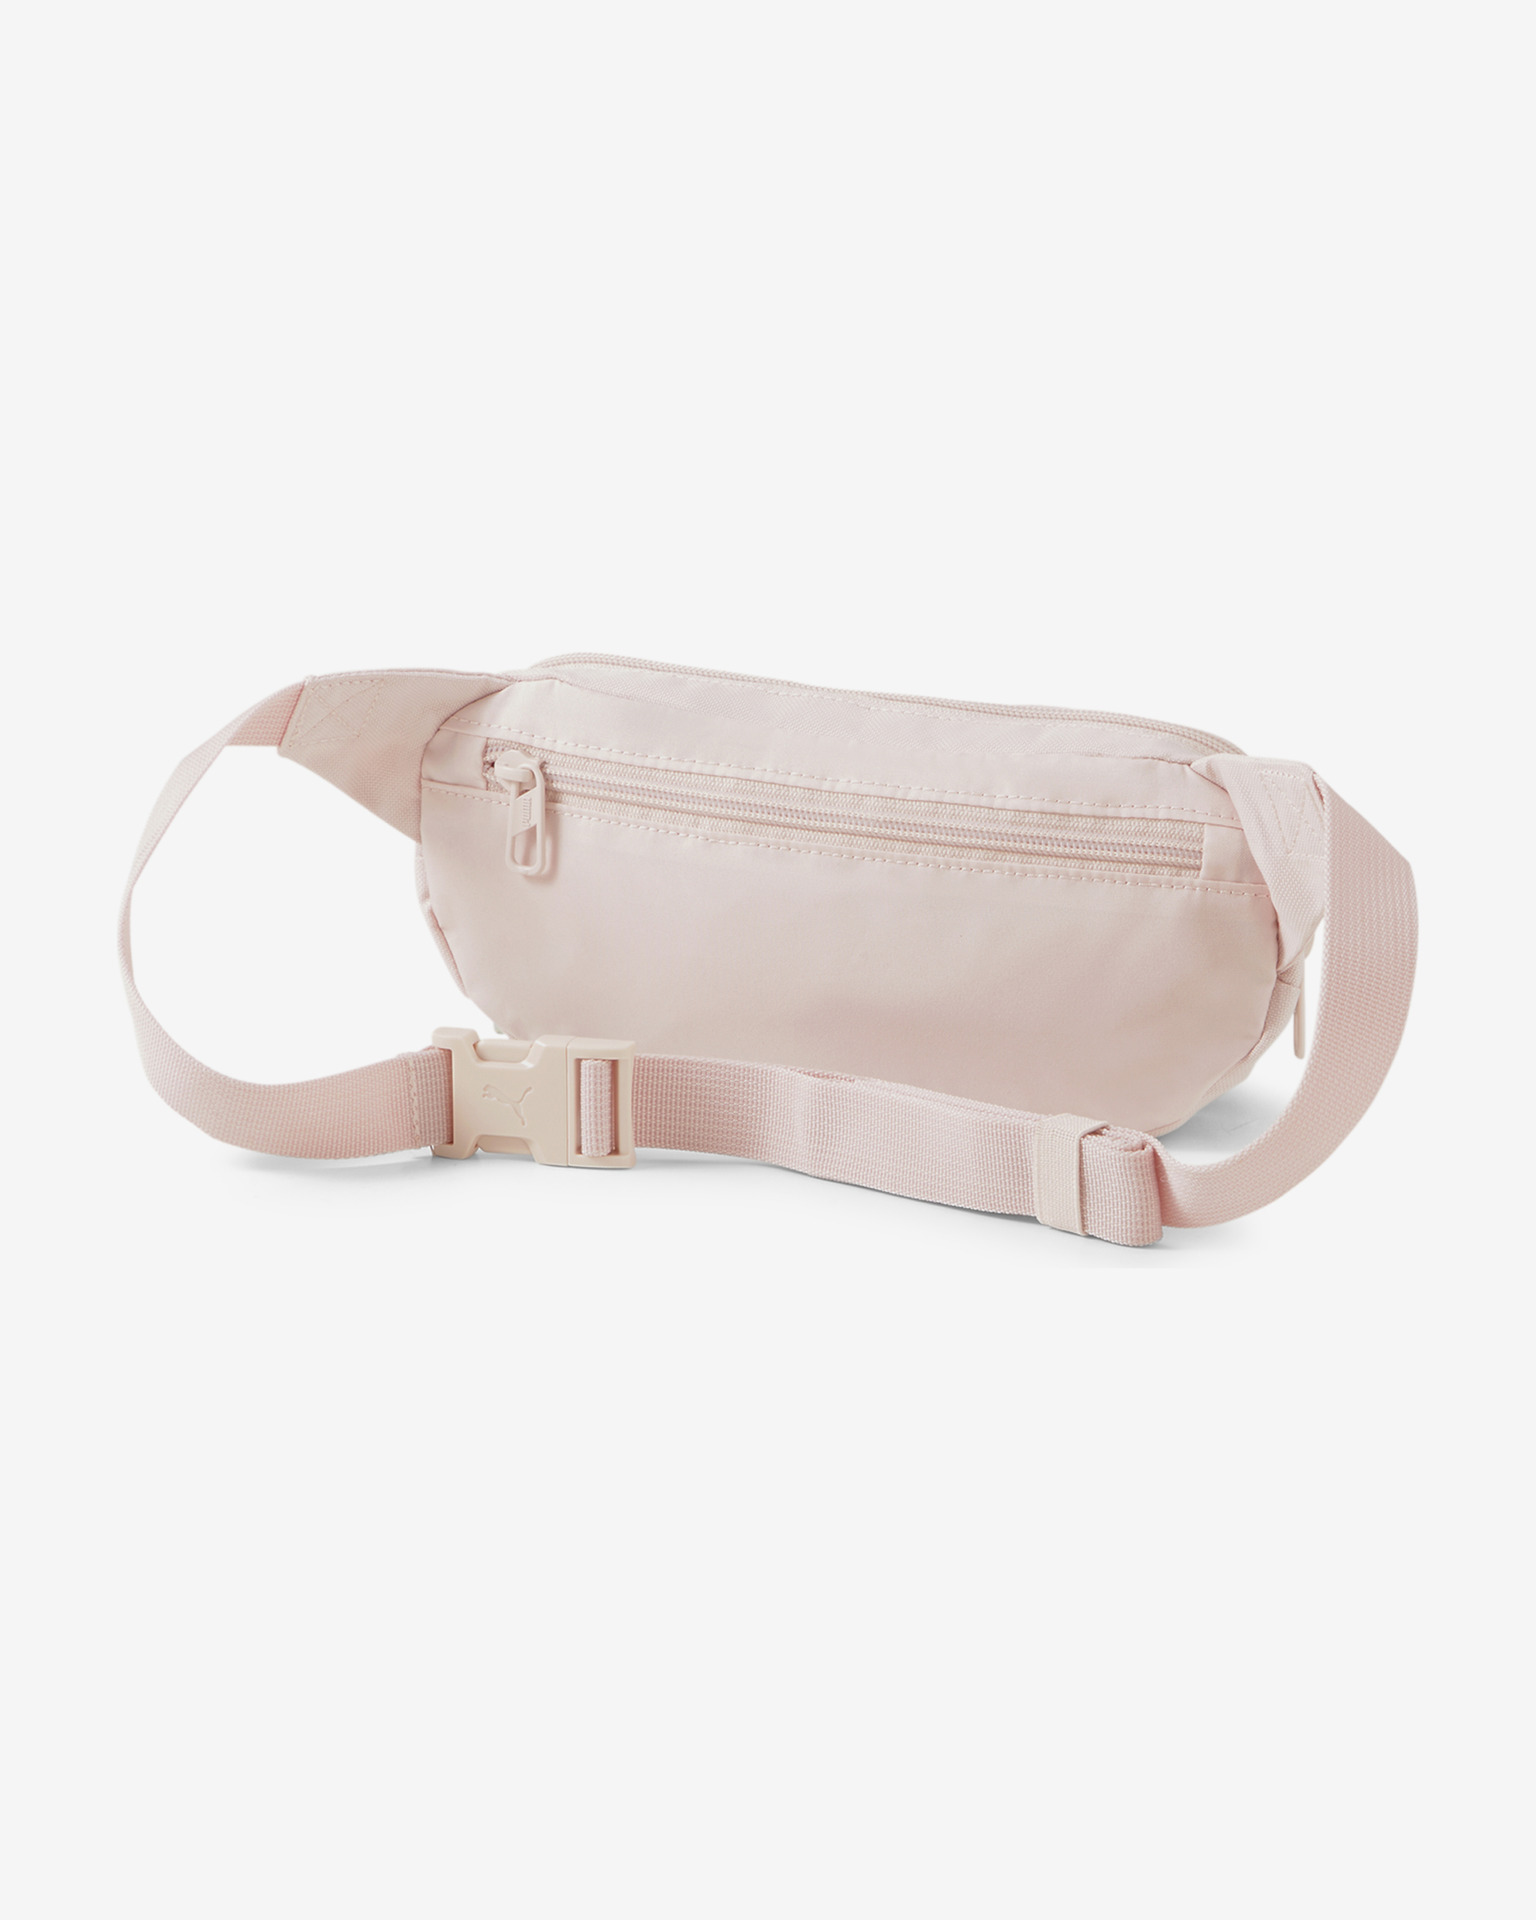 Puma Women's bum bag pink Ledvinka